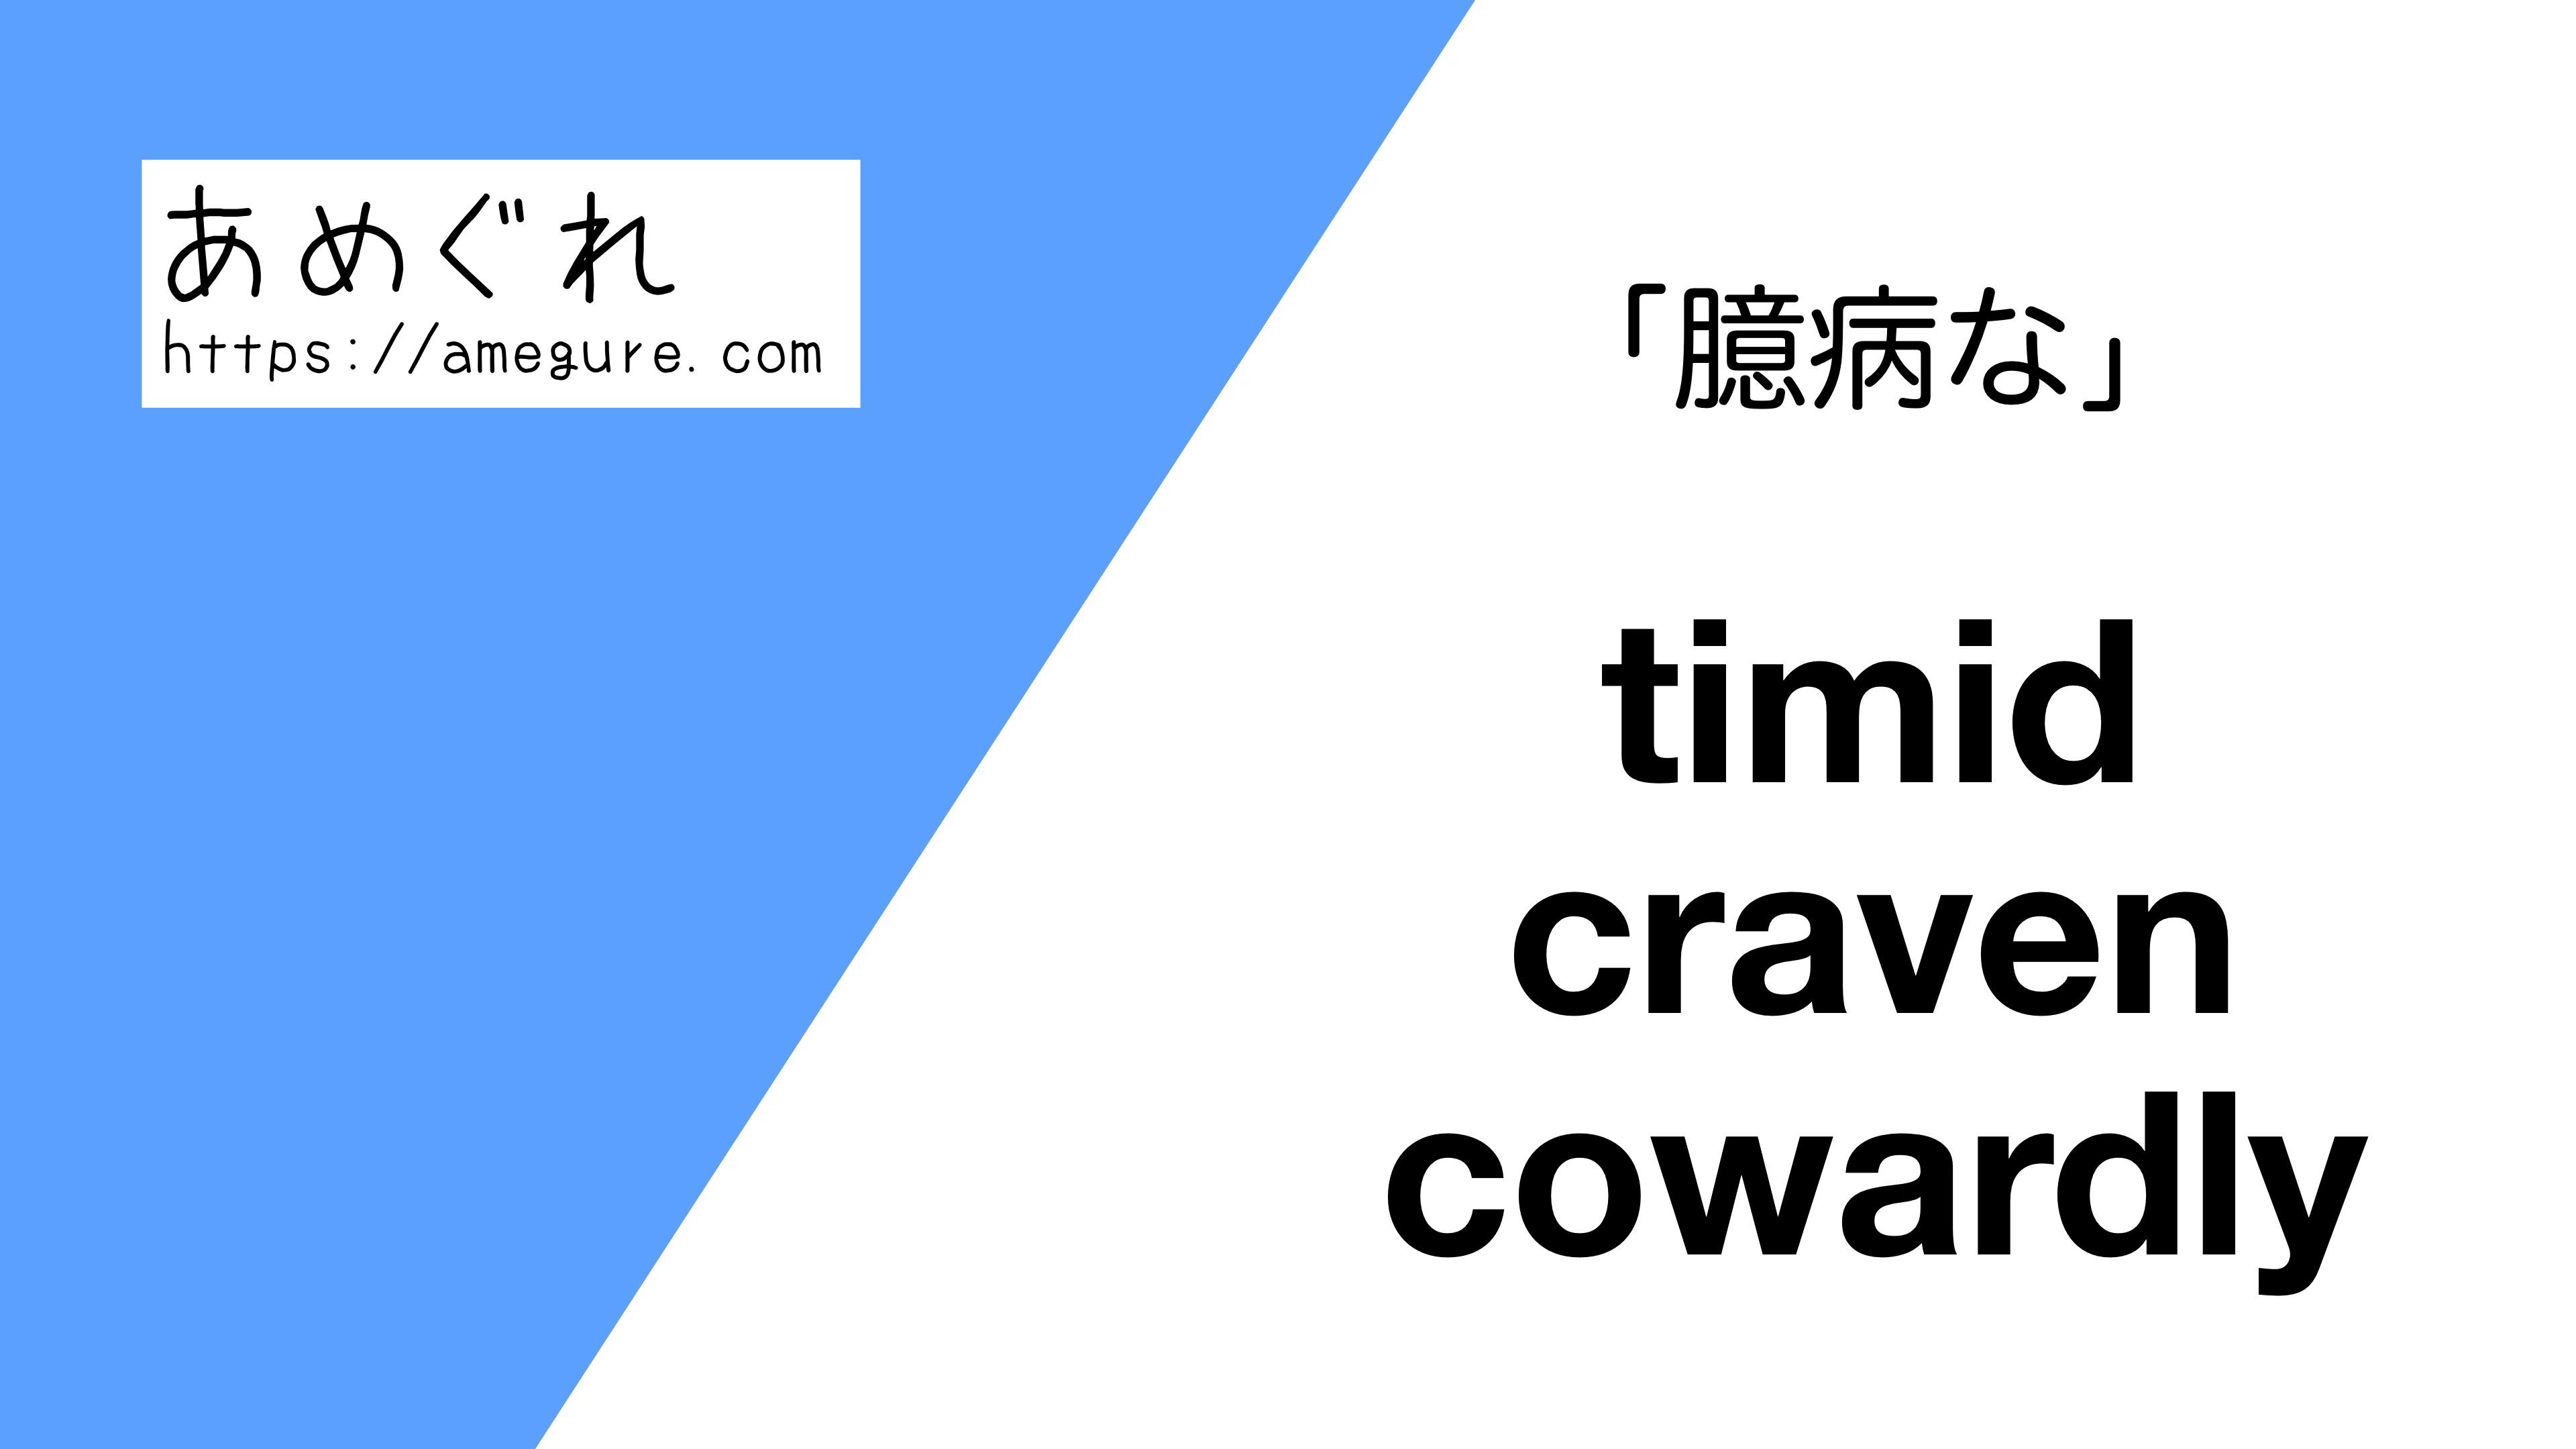 timid-craven-cowardly違い